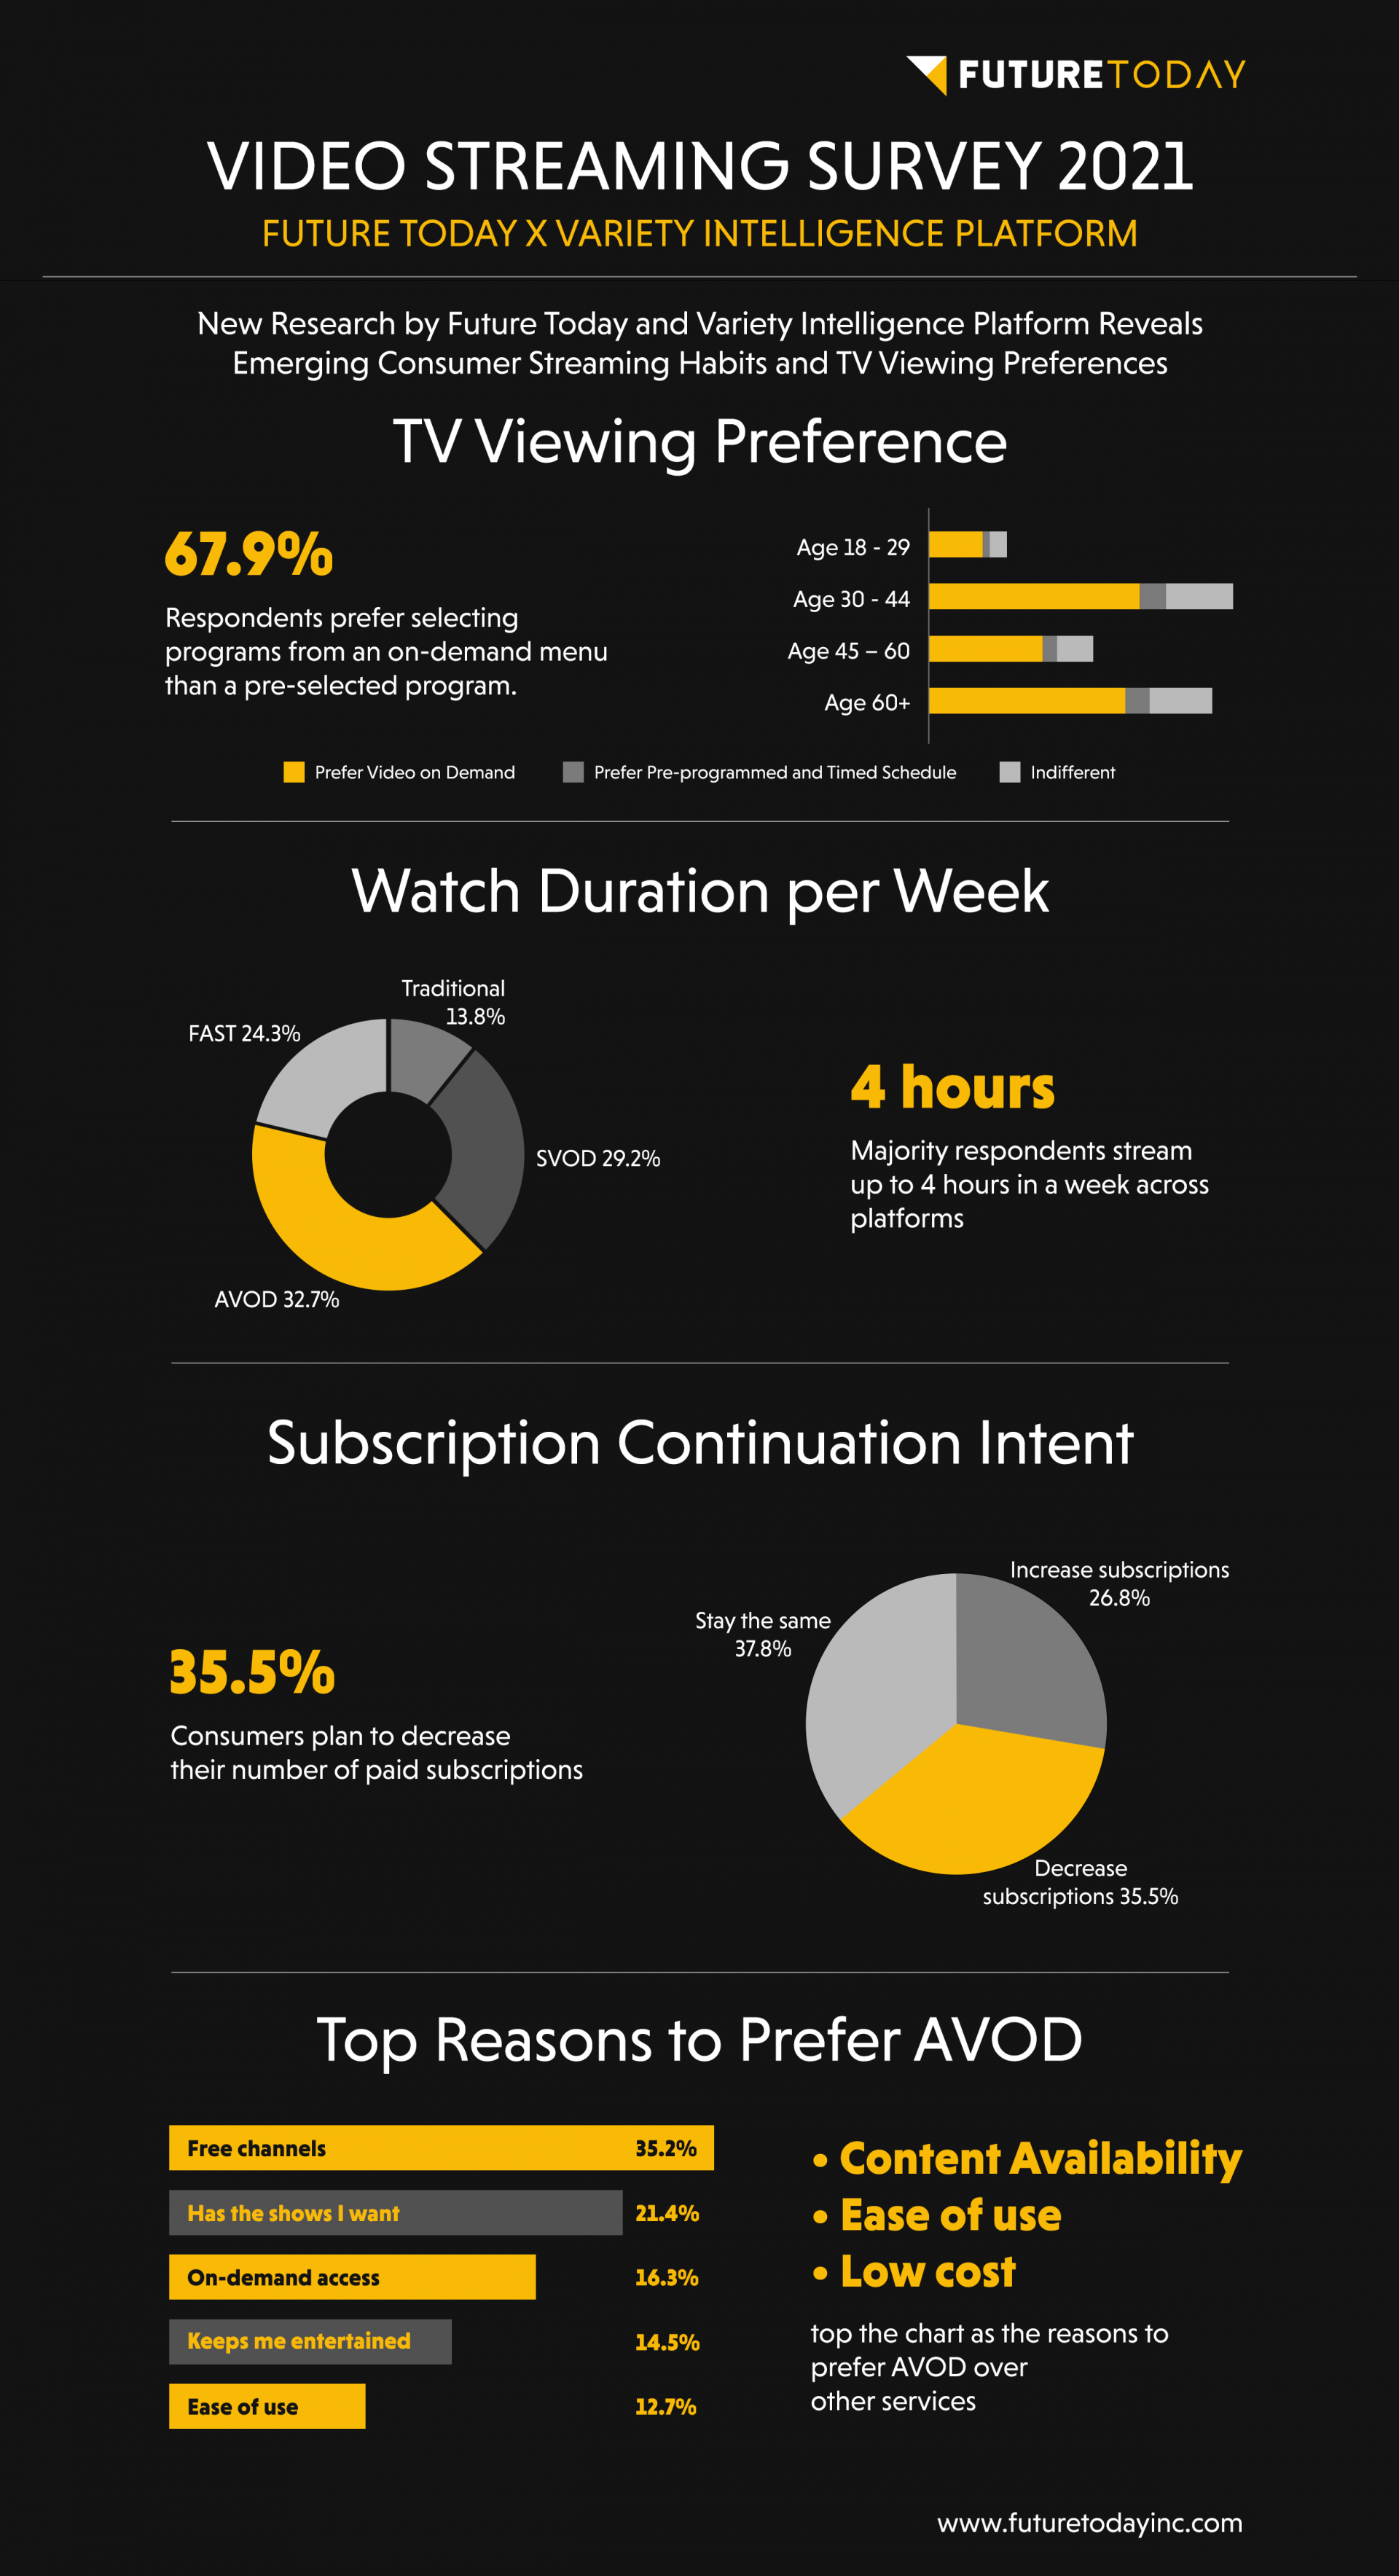 Future Today x Variety Intelligence Platform Streaming Study Infographic